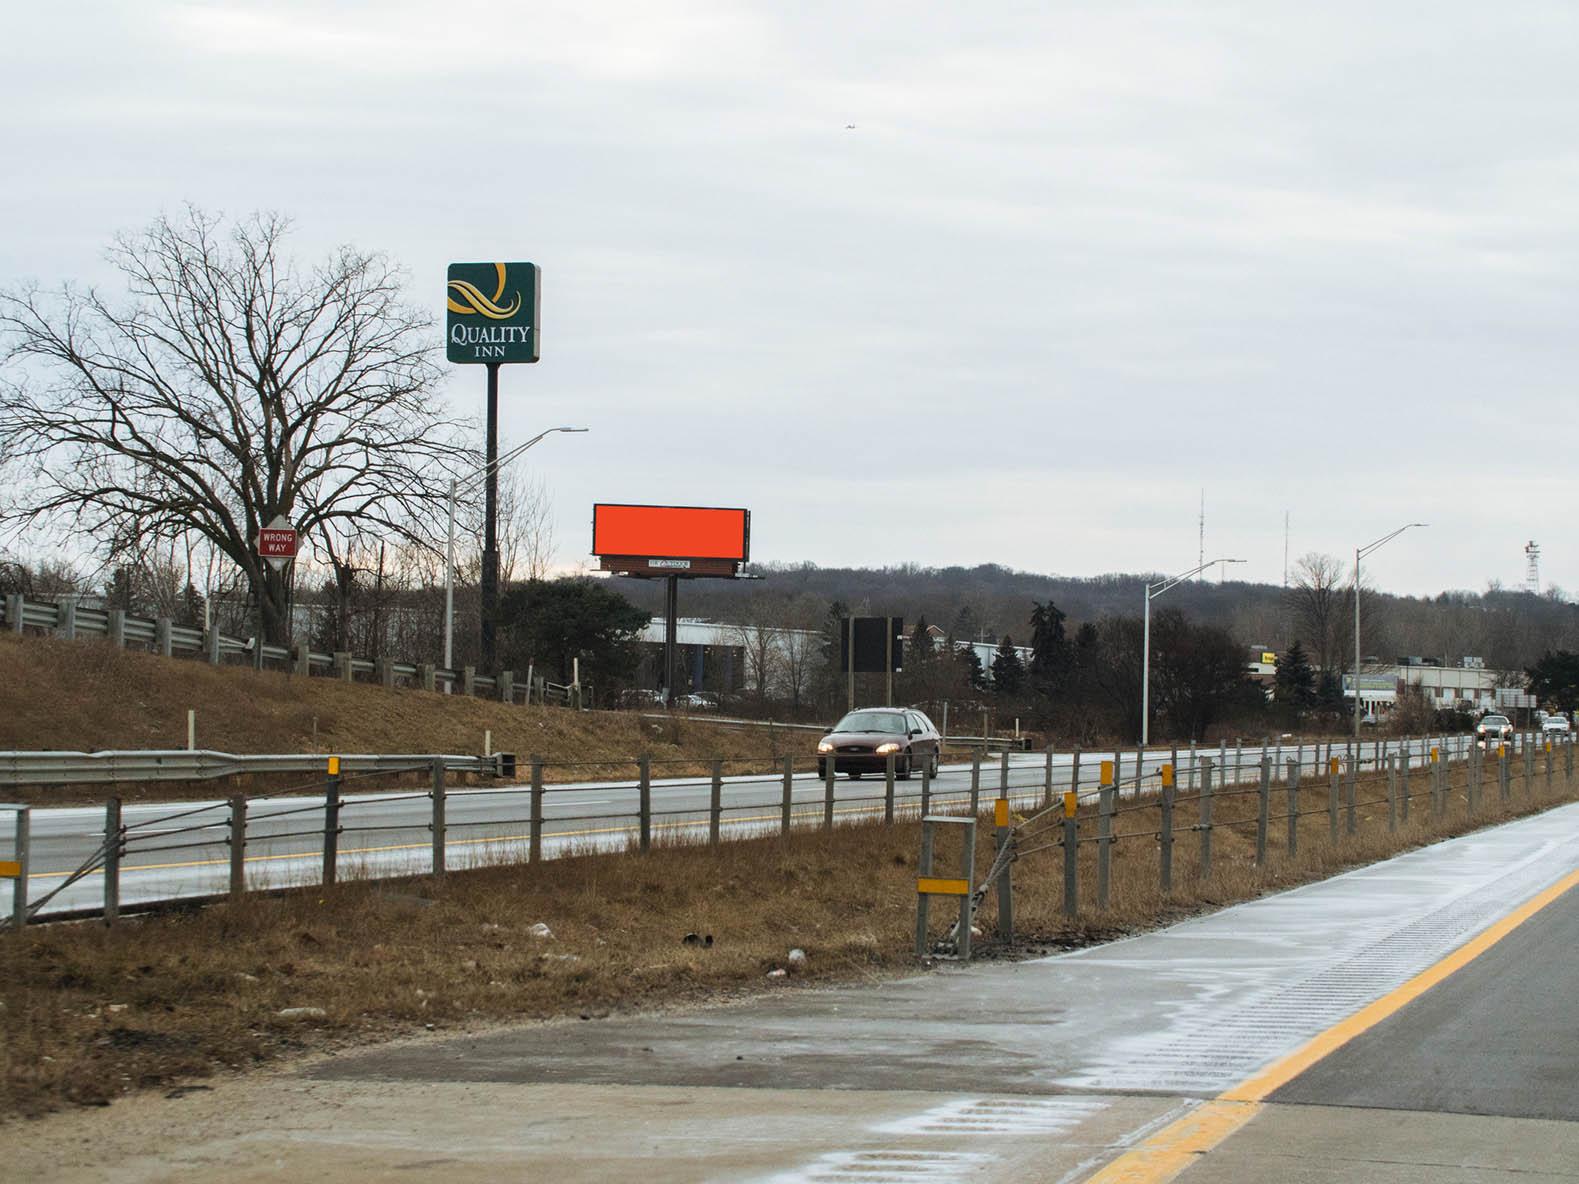 Billboard 109 North (10 x 30) - Geopath: 30655428